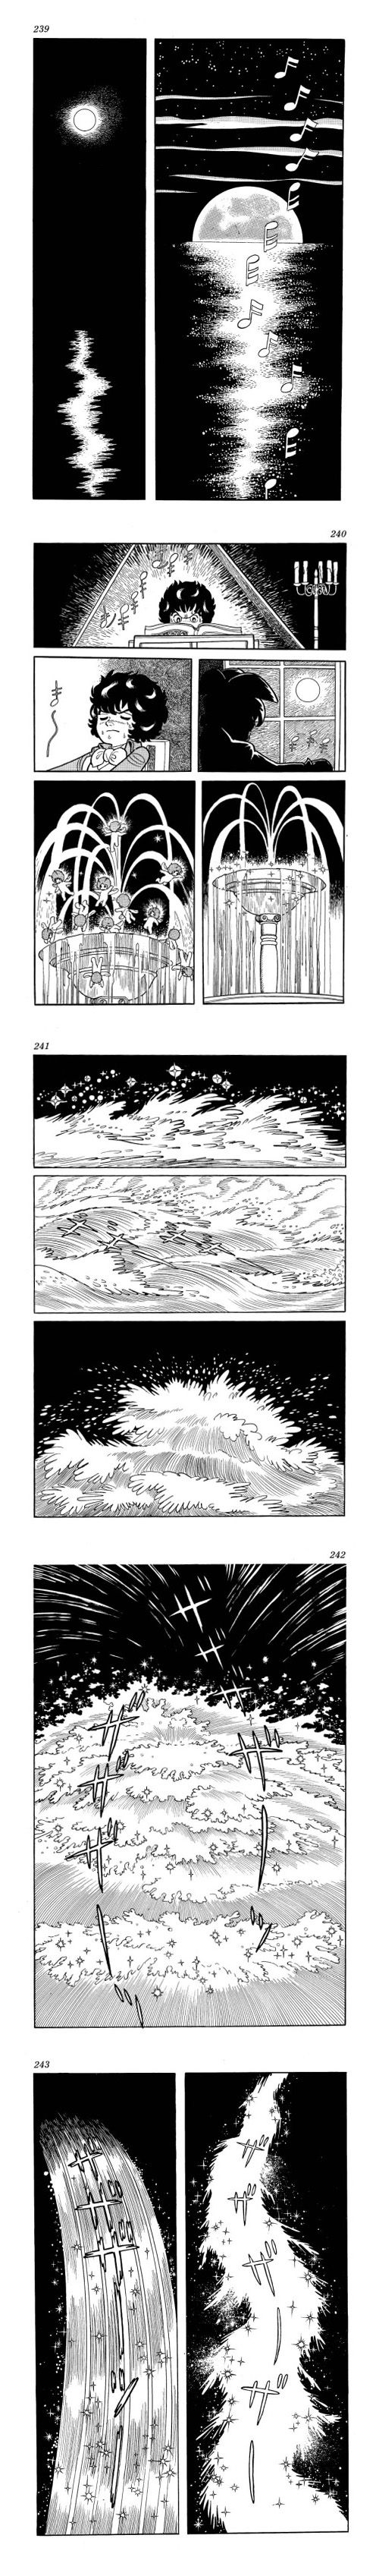 TEZUKA Osamu (手塚治虫), Ludwig B / ルードウィヒ・B